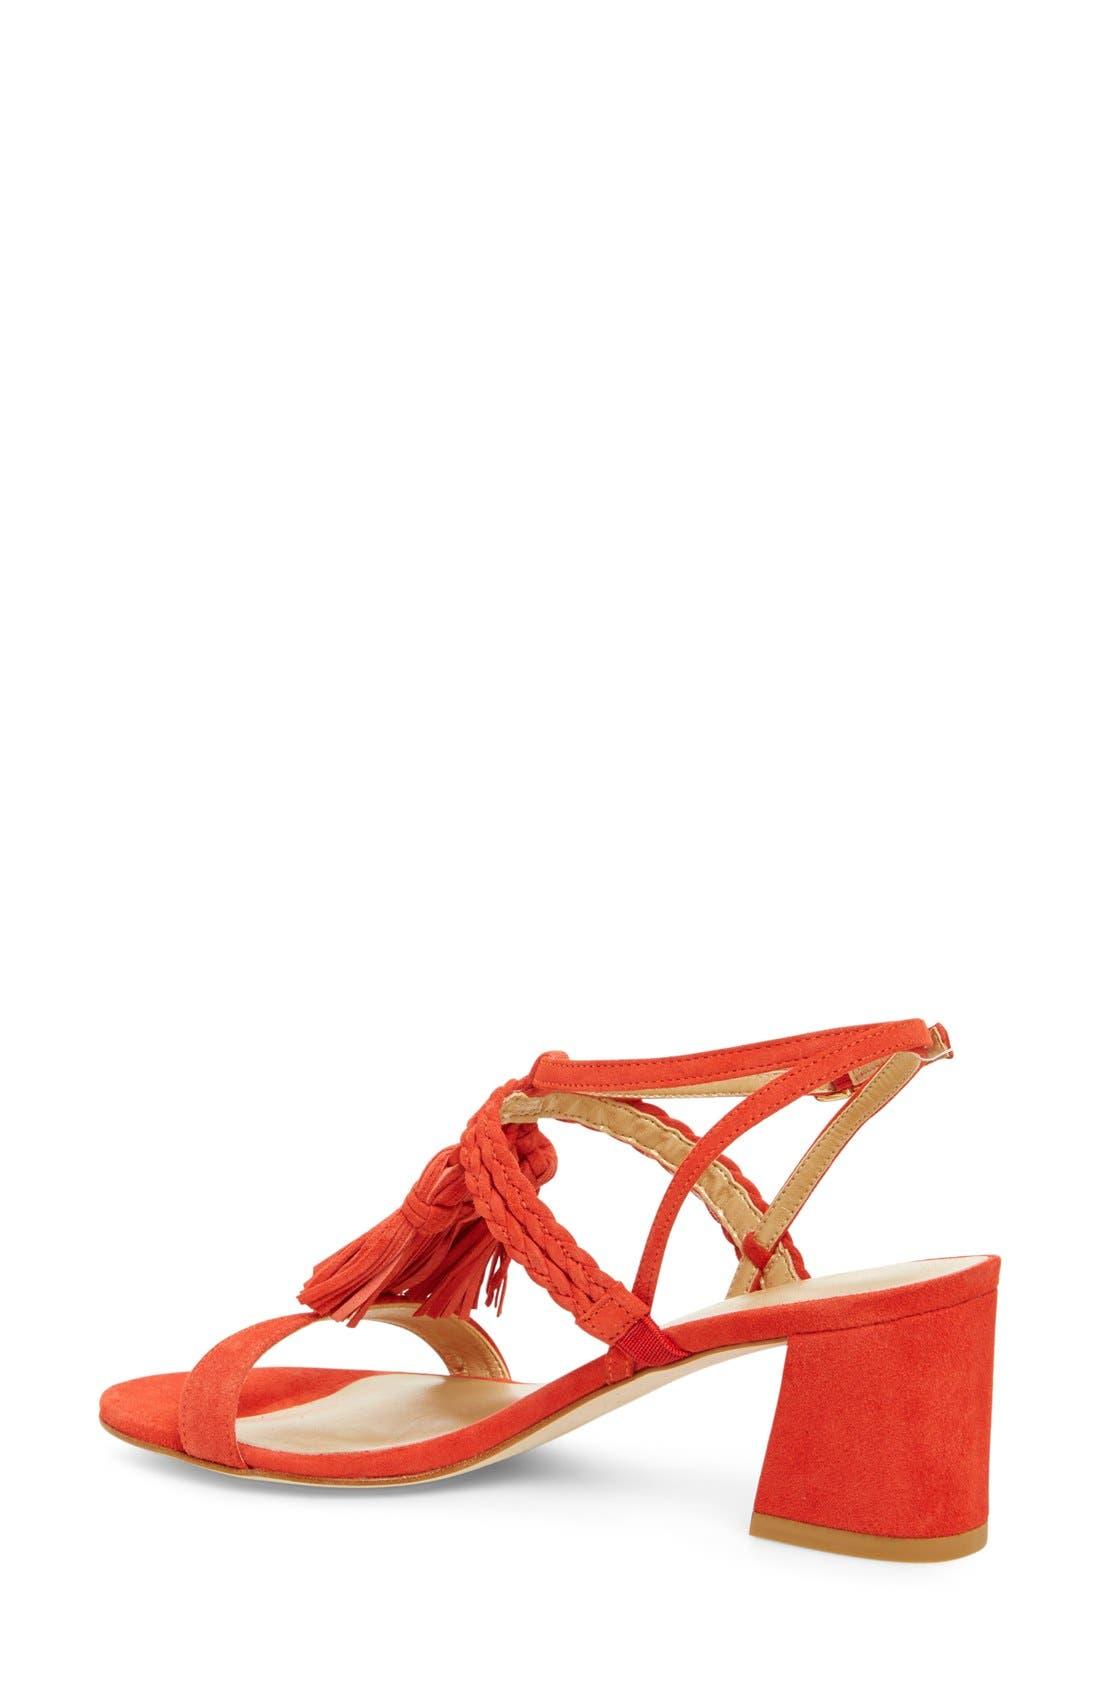 Alternate Image 3  - Stuart Weitzman 'Tasselmania' Strappy Sandal (Women)